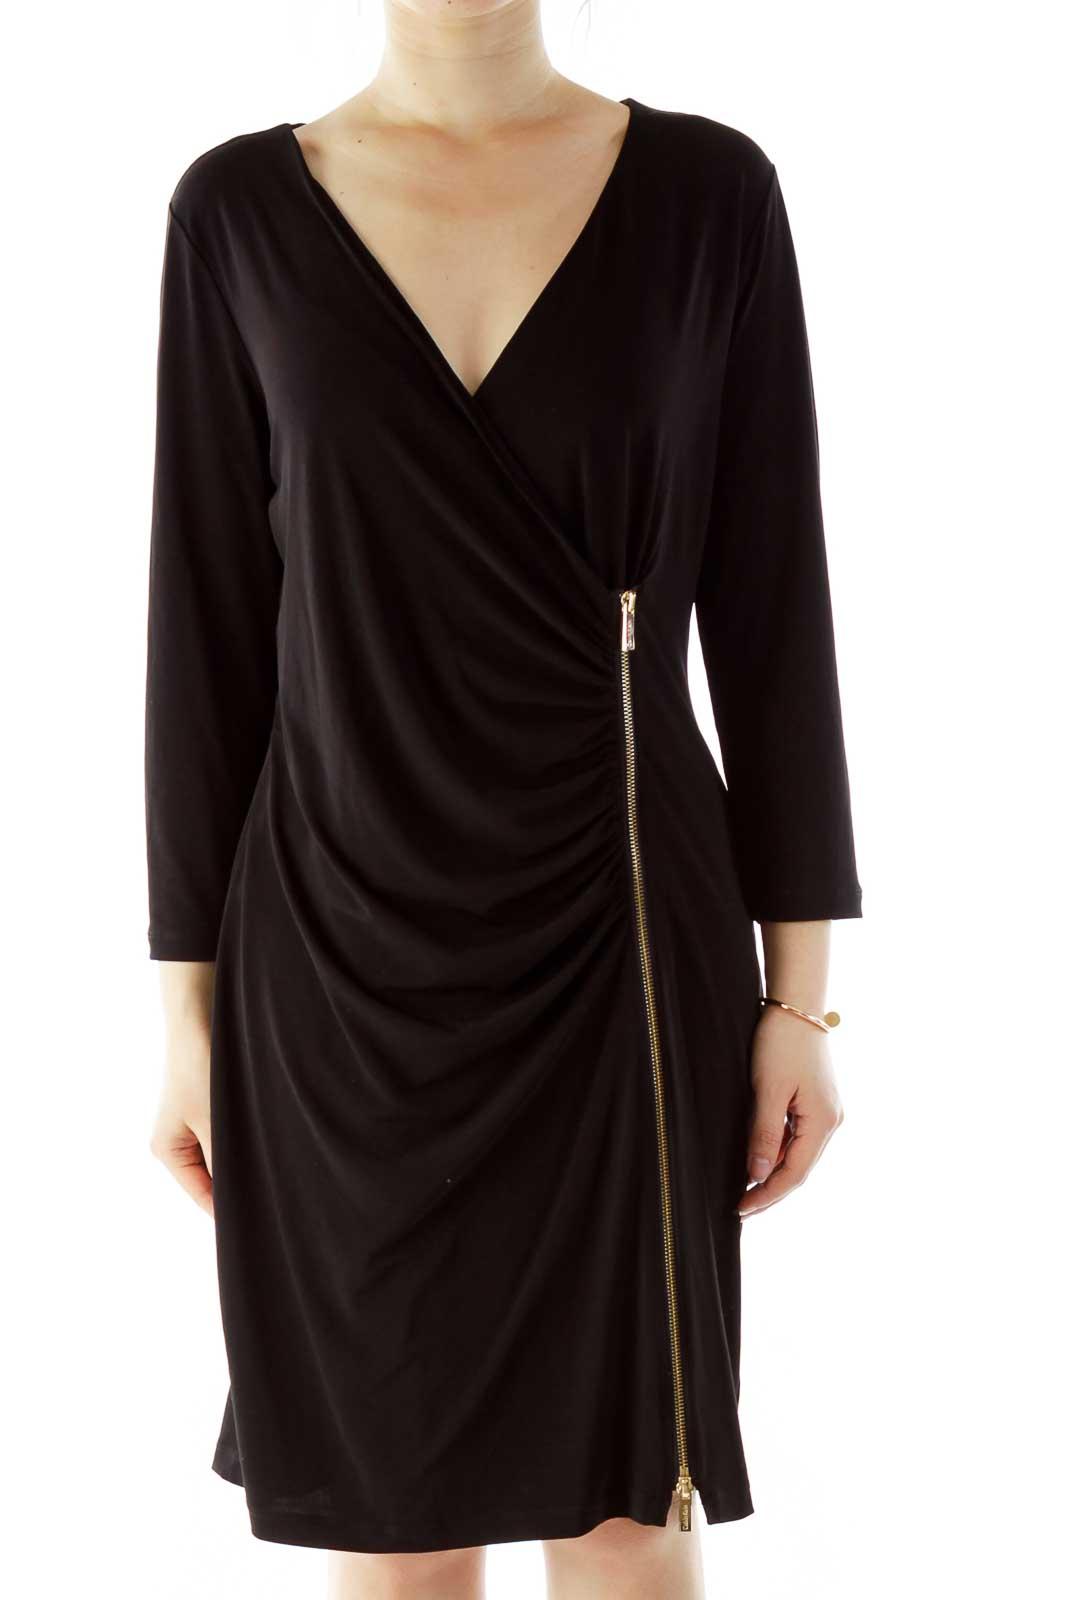 Black Zippered V-Neck Work Dress Front